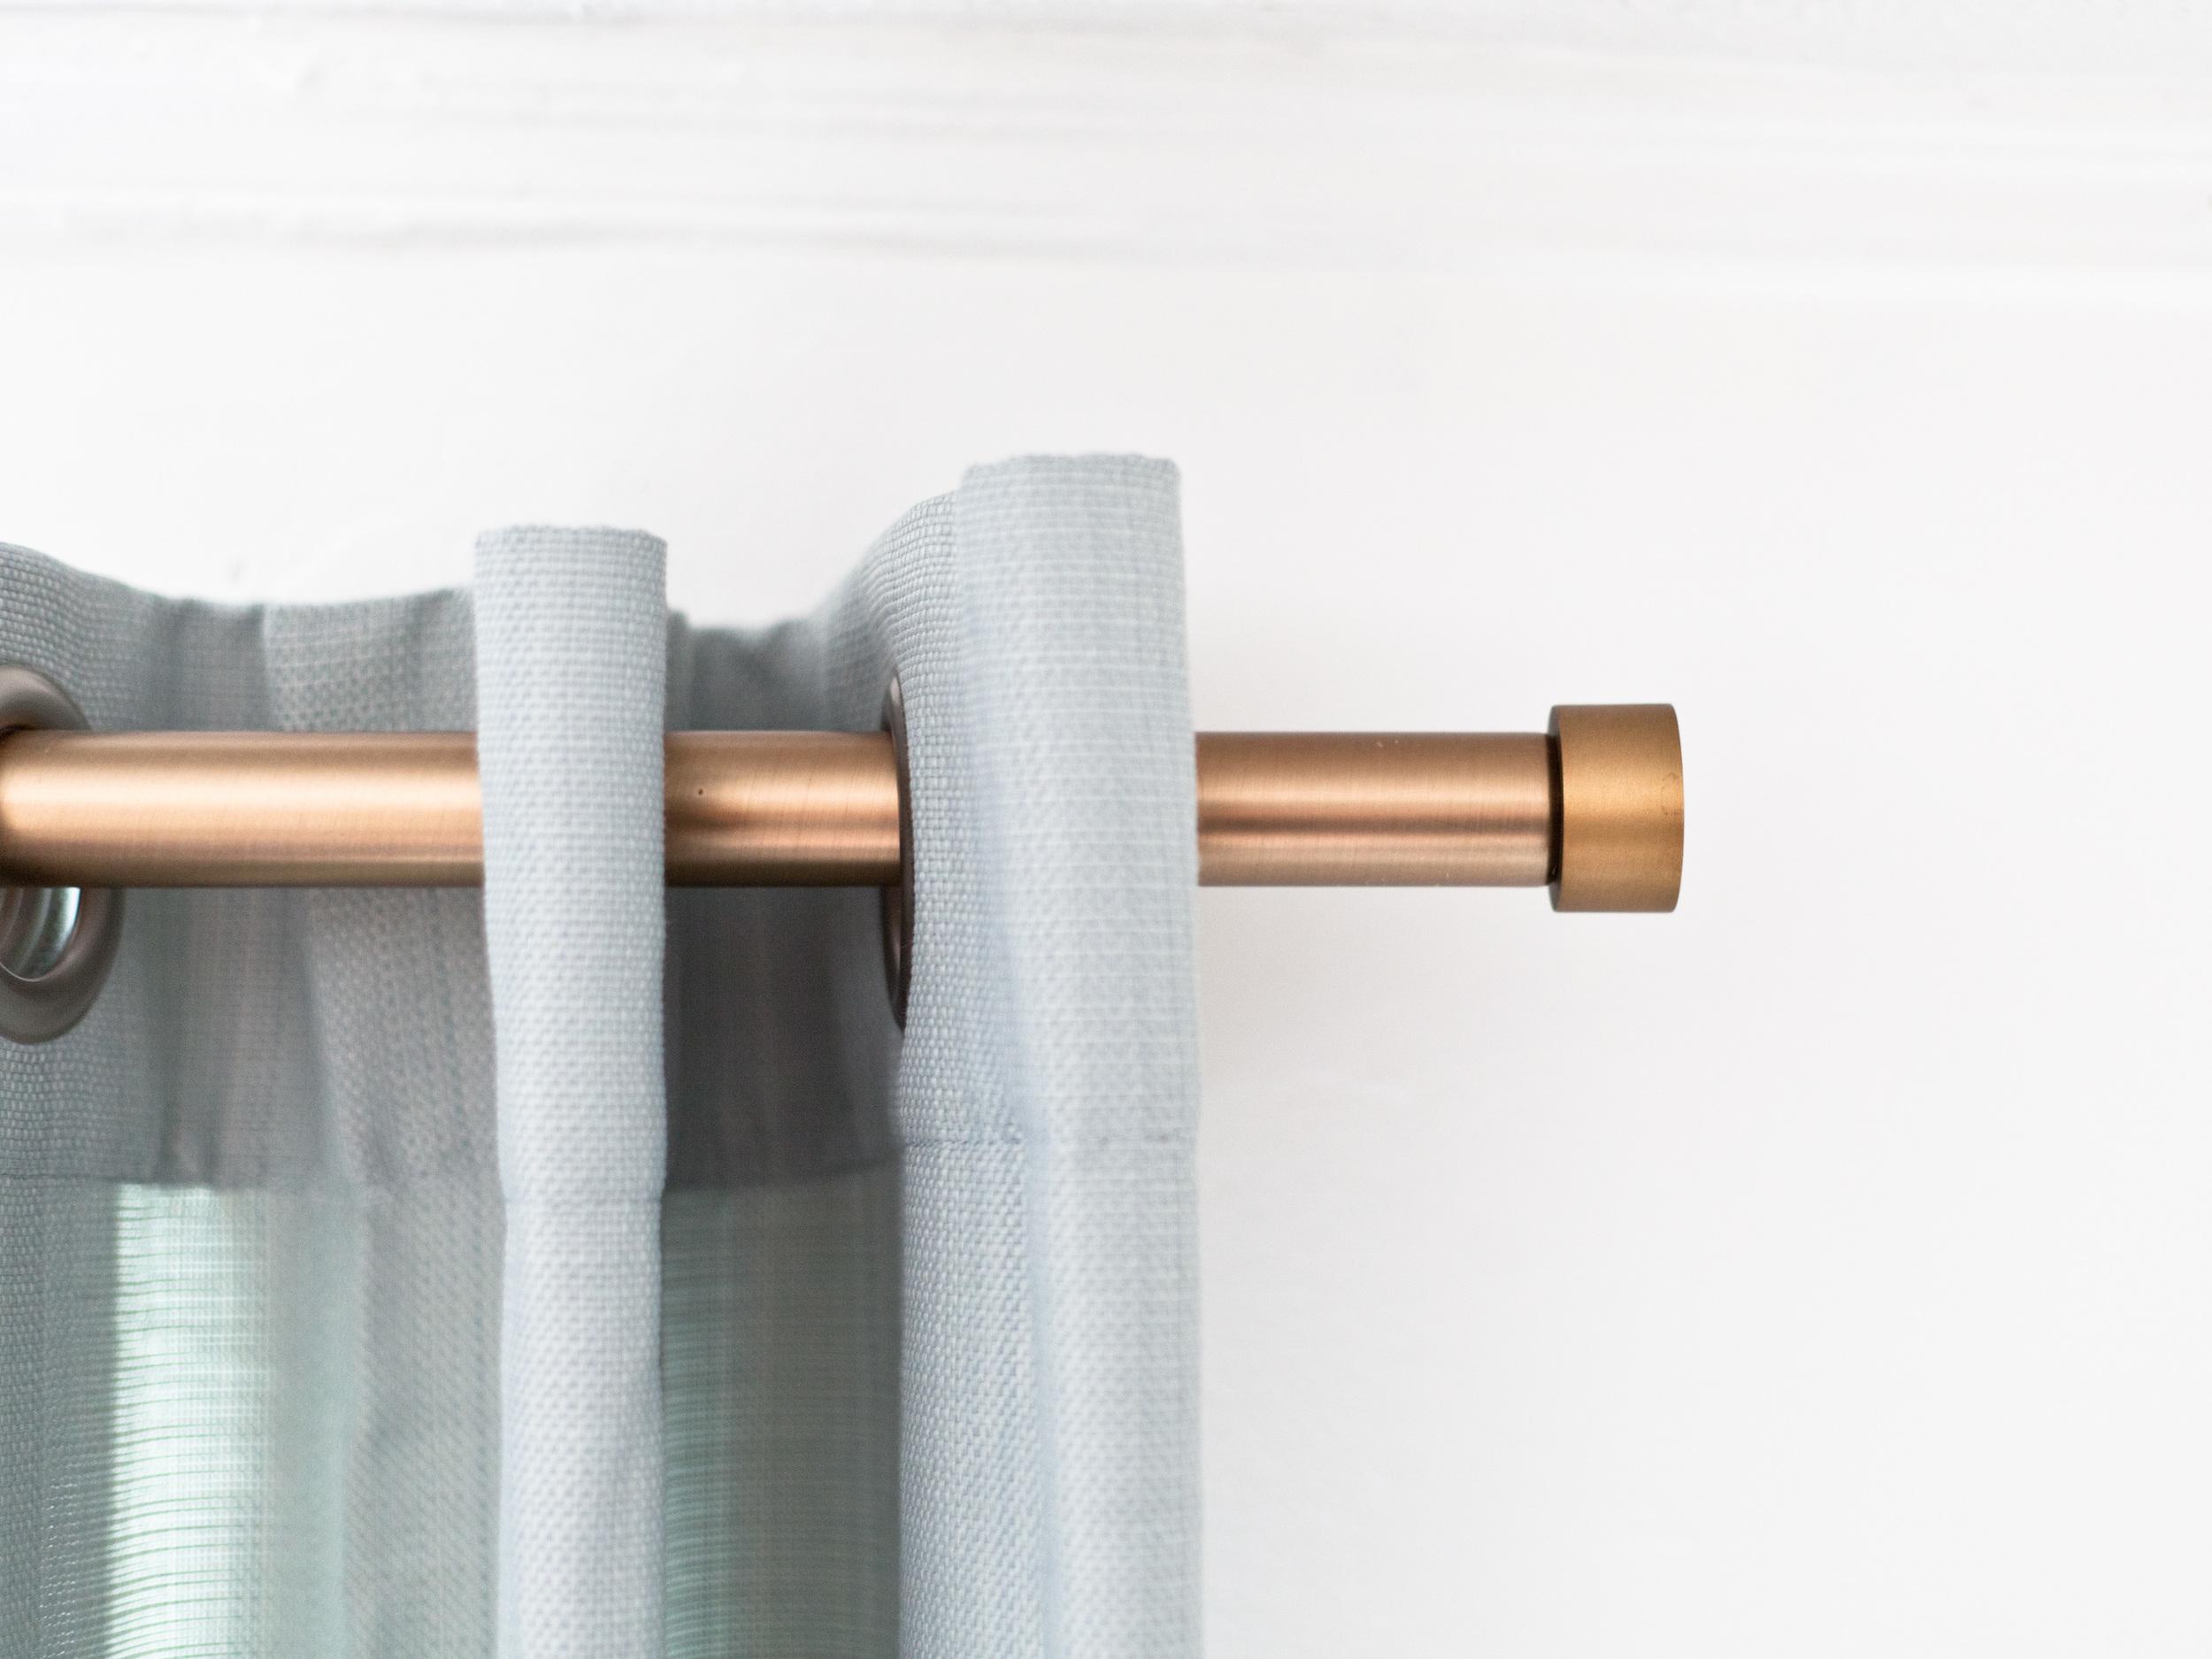 Minimalist Master Bedroom Reveal: Simplified Garden, White Floors